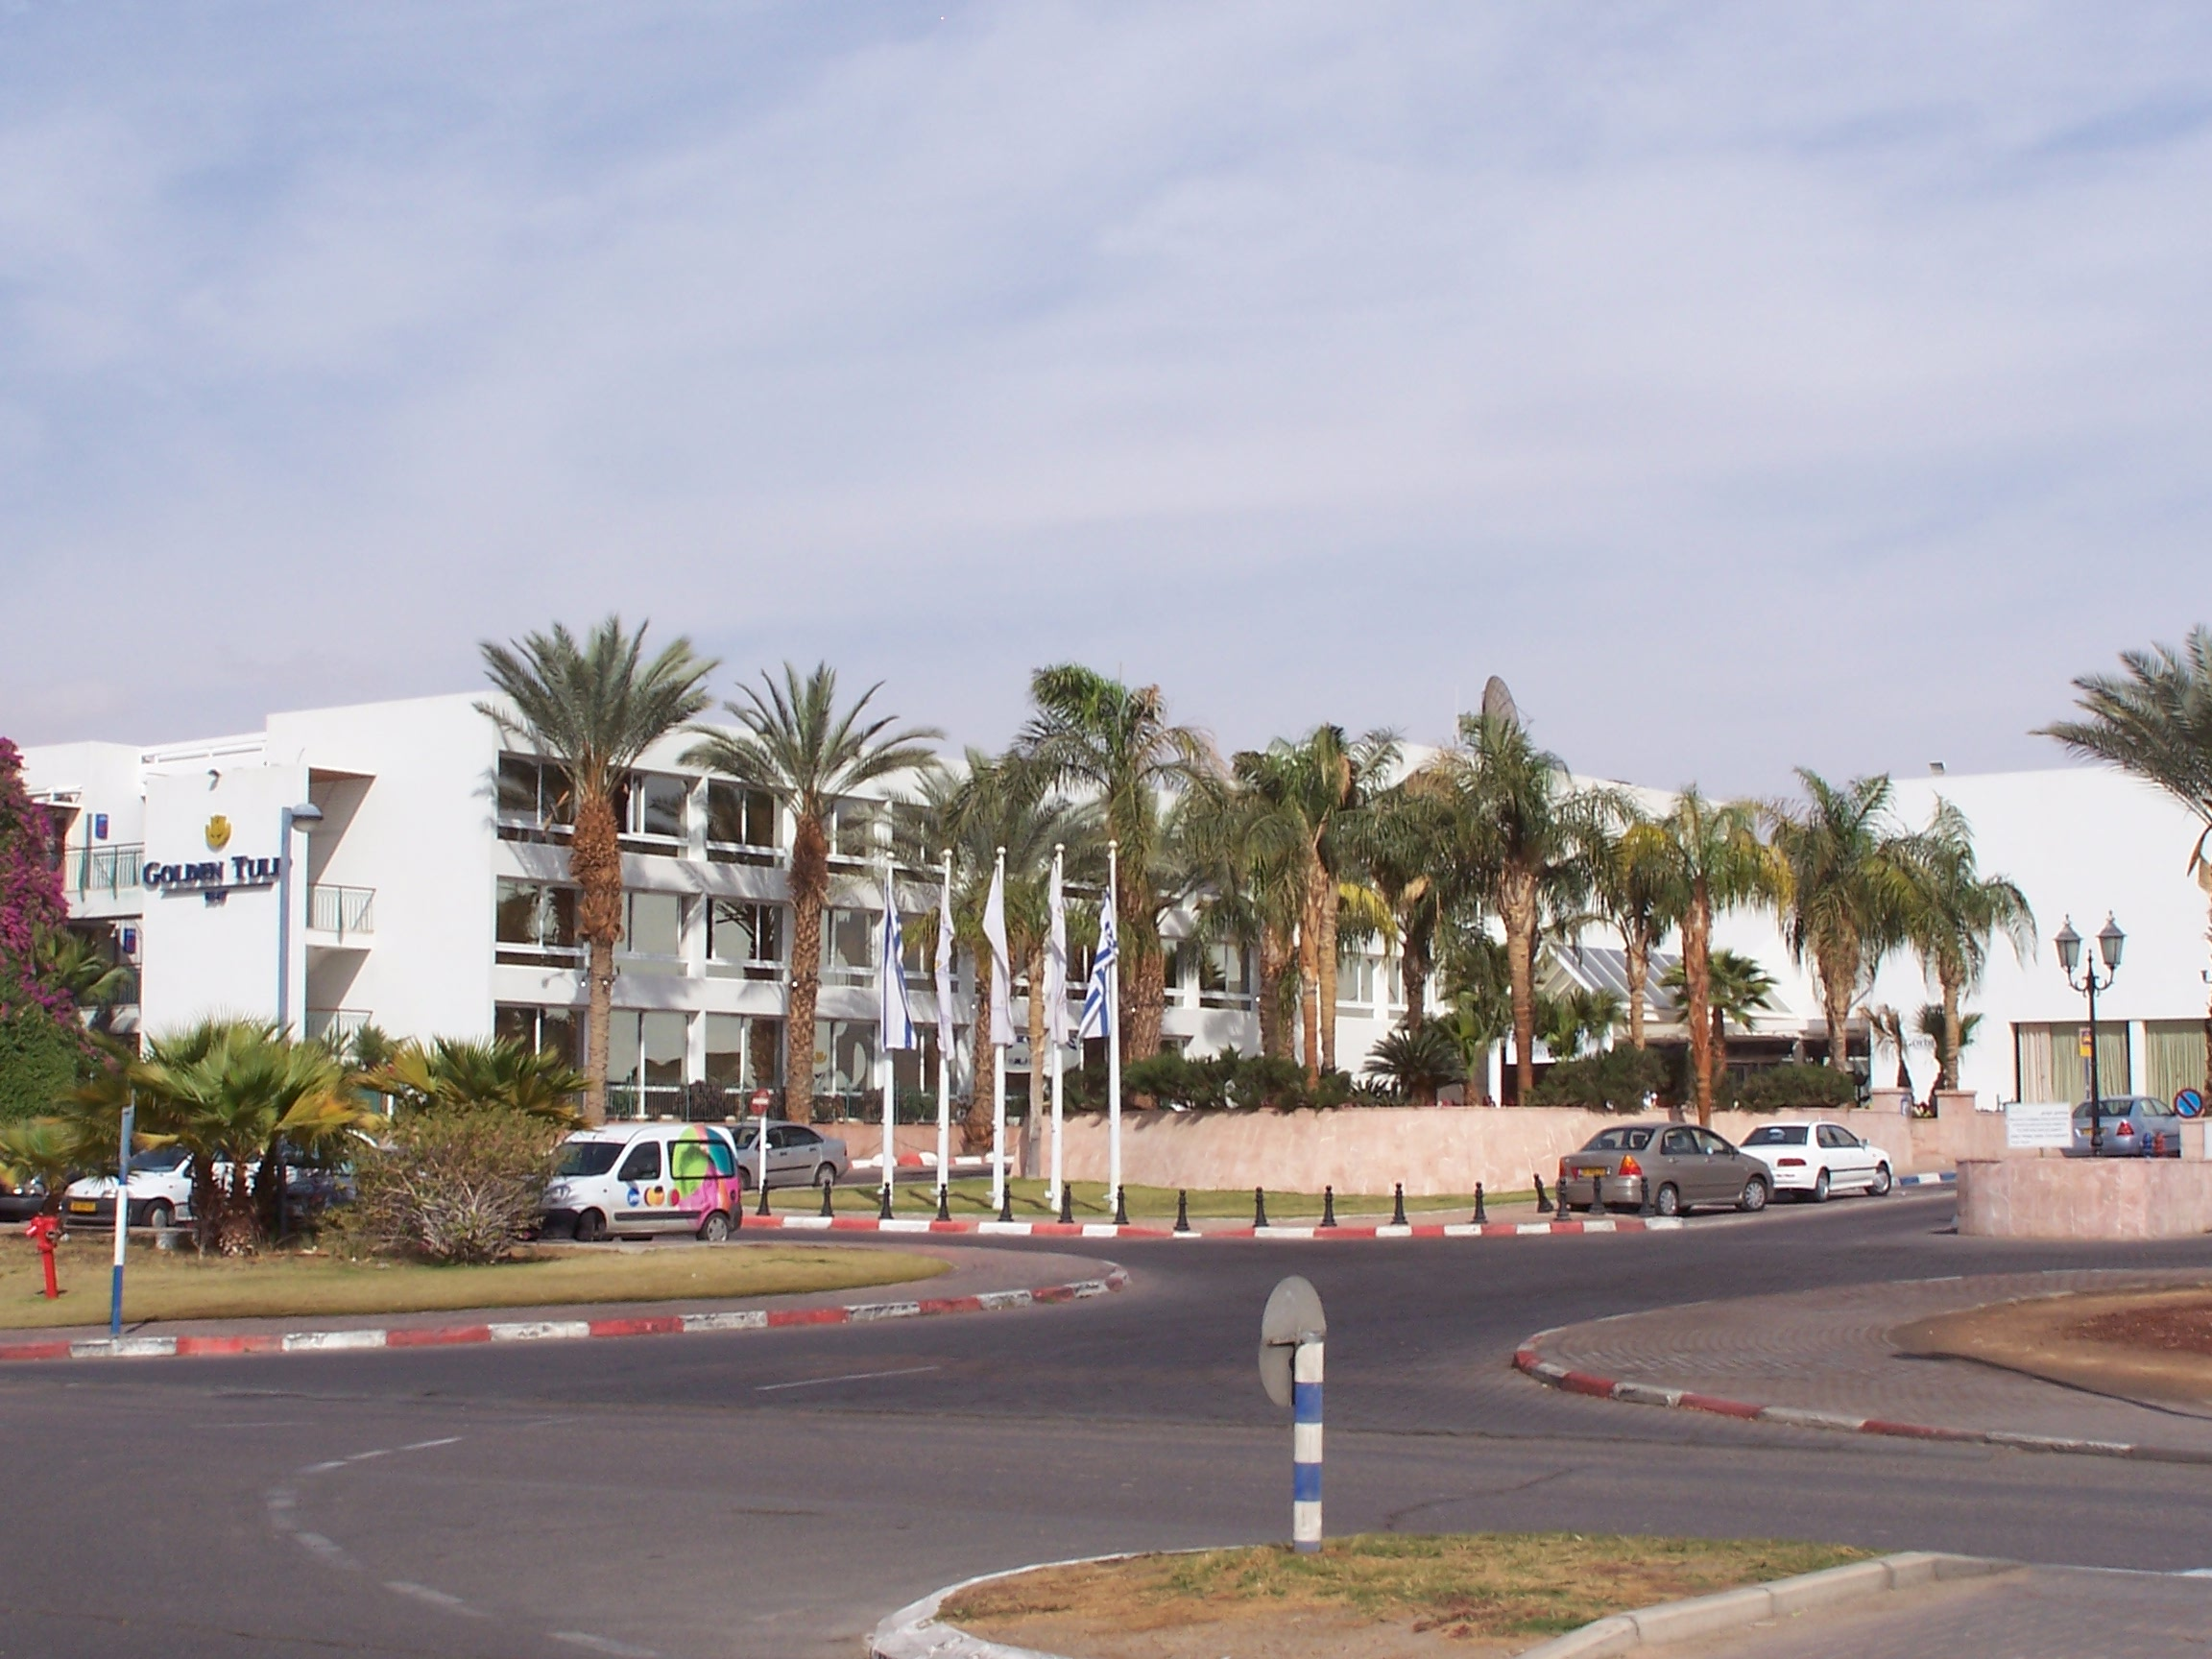 English: Golden Tulip Hotel in Eilat, Israel S...